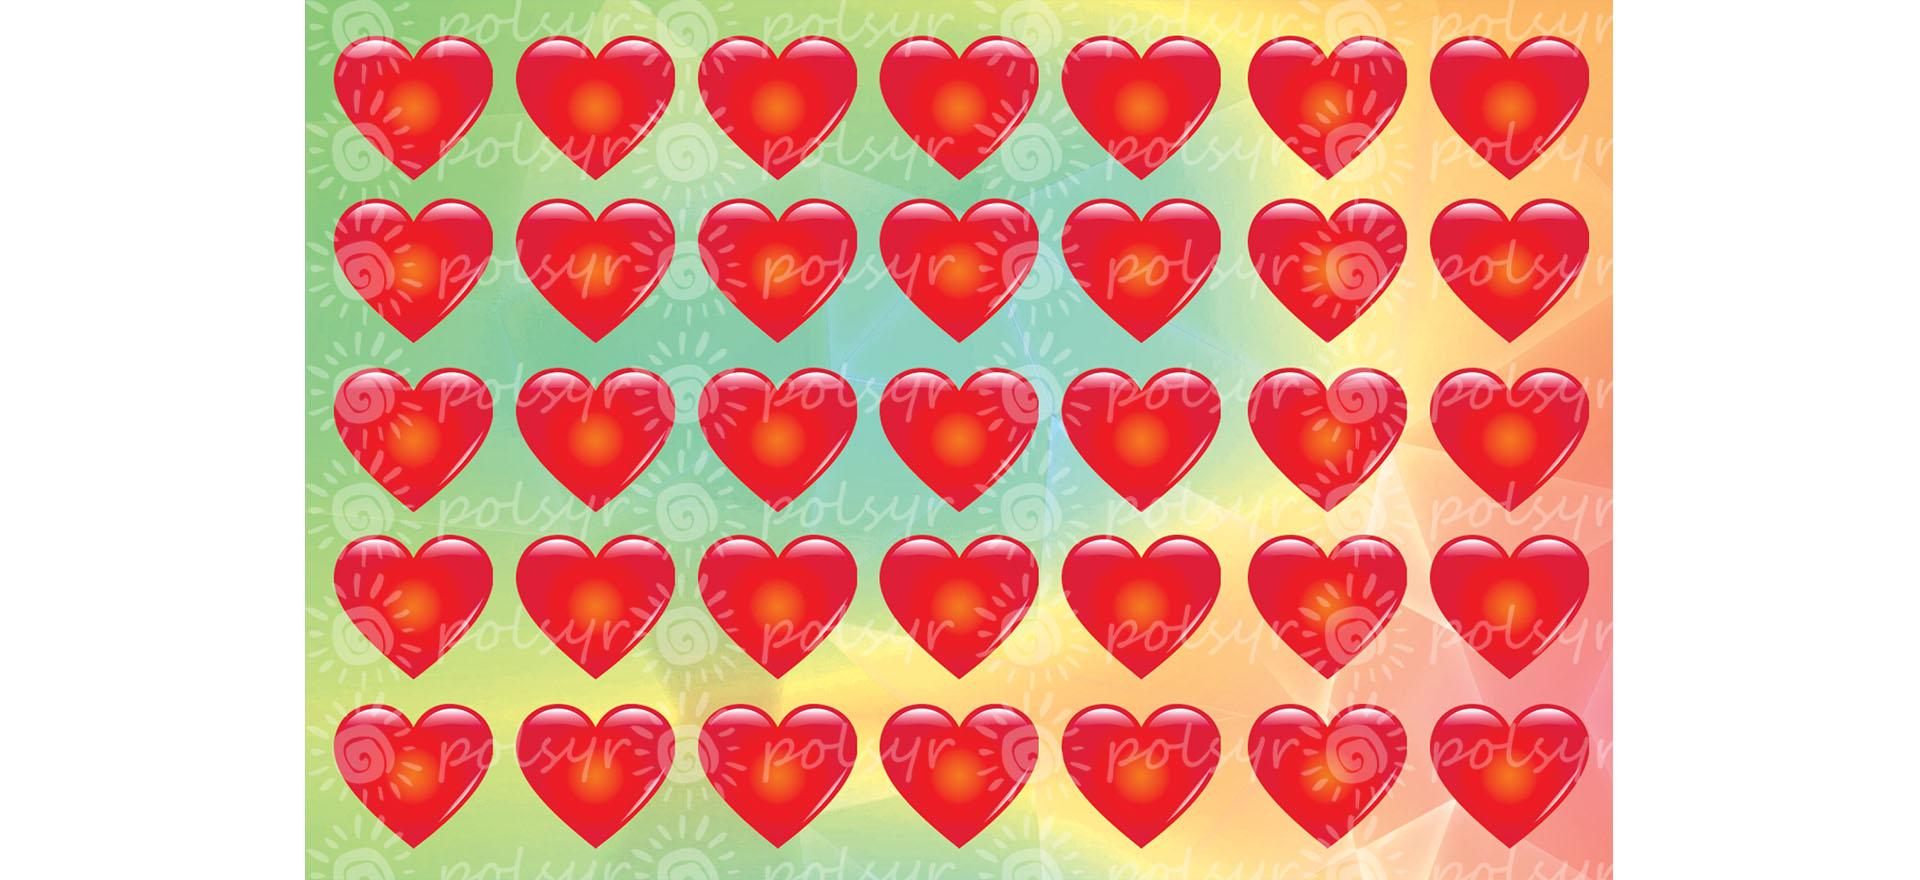 naklejki-serca-male-polsyr-2